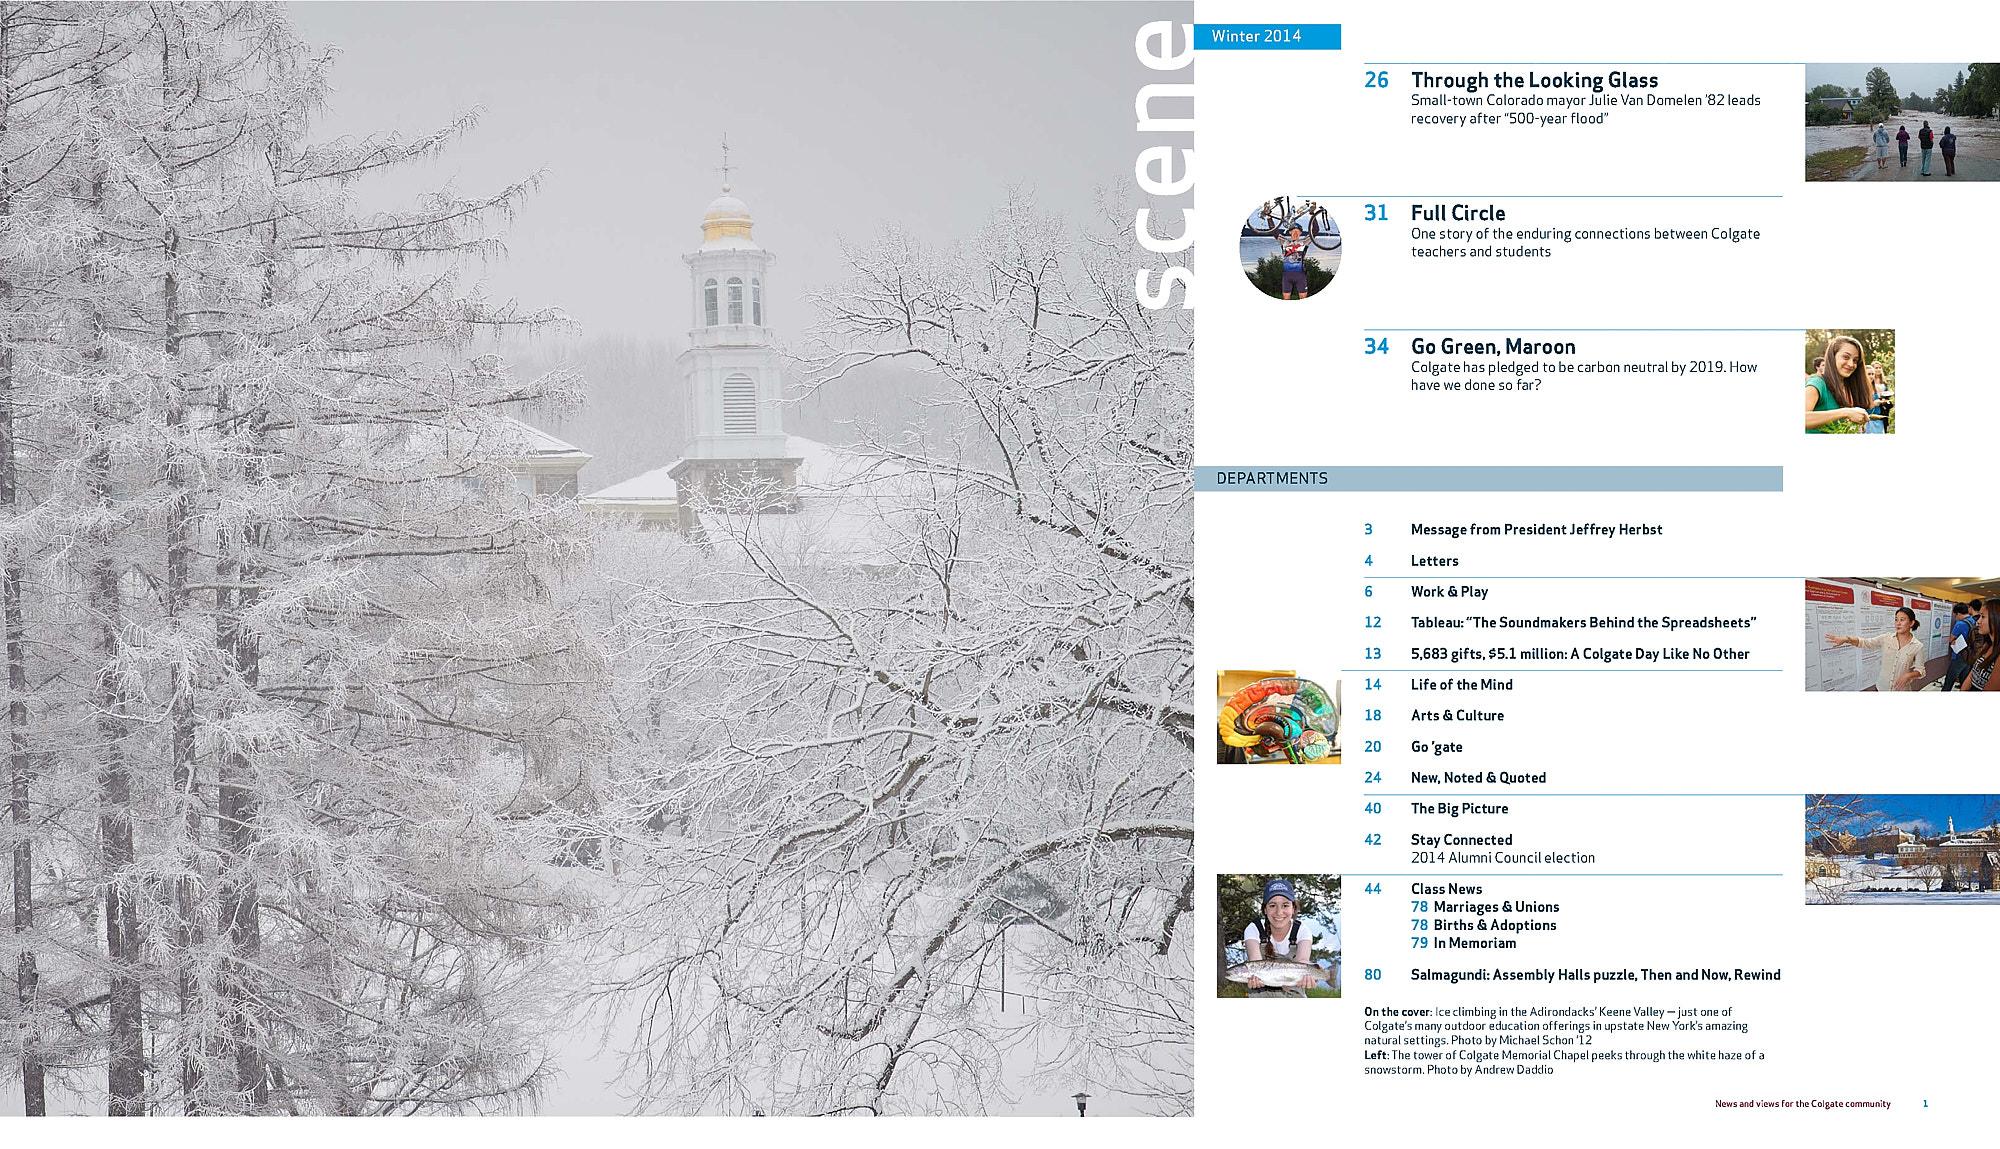 062_Scene Winter 2014_Page_02-03.jpg